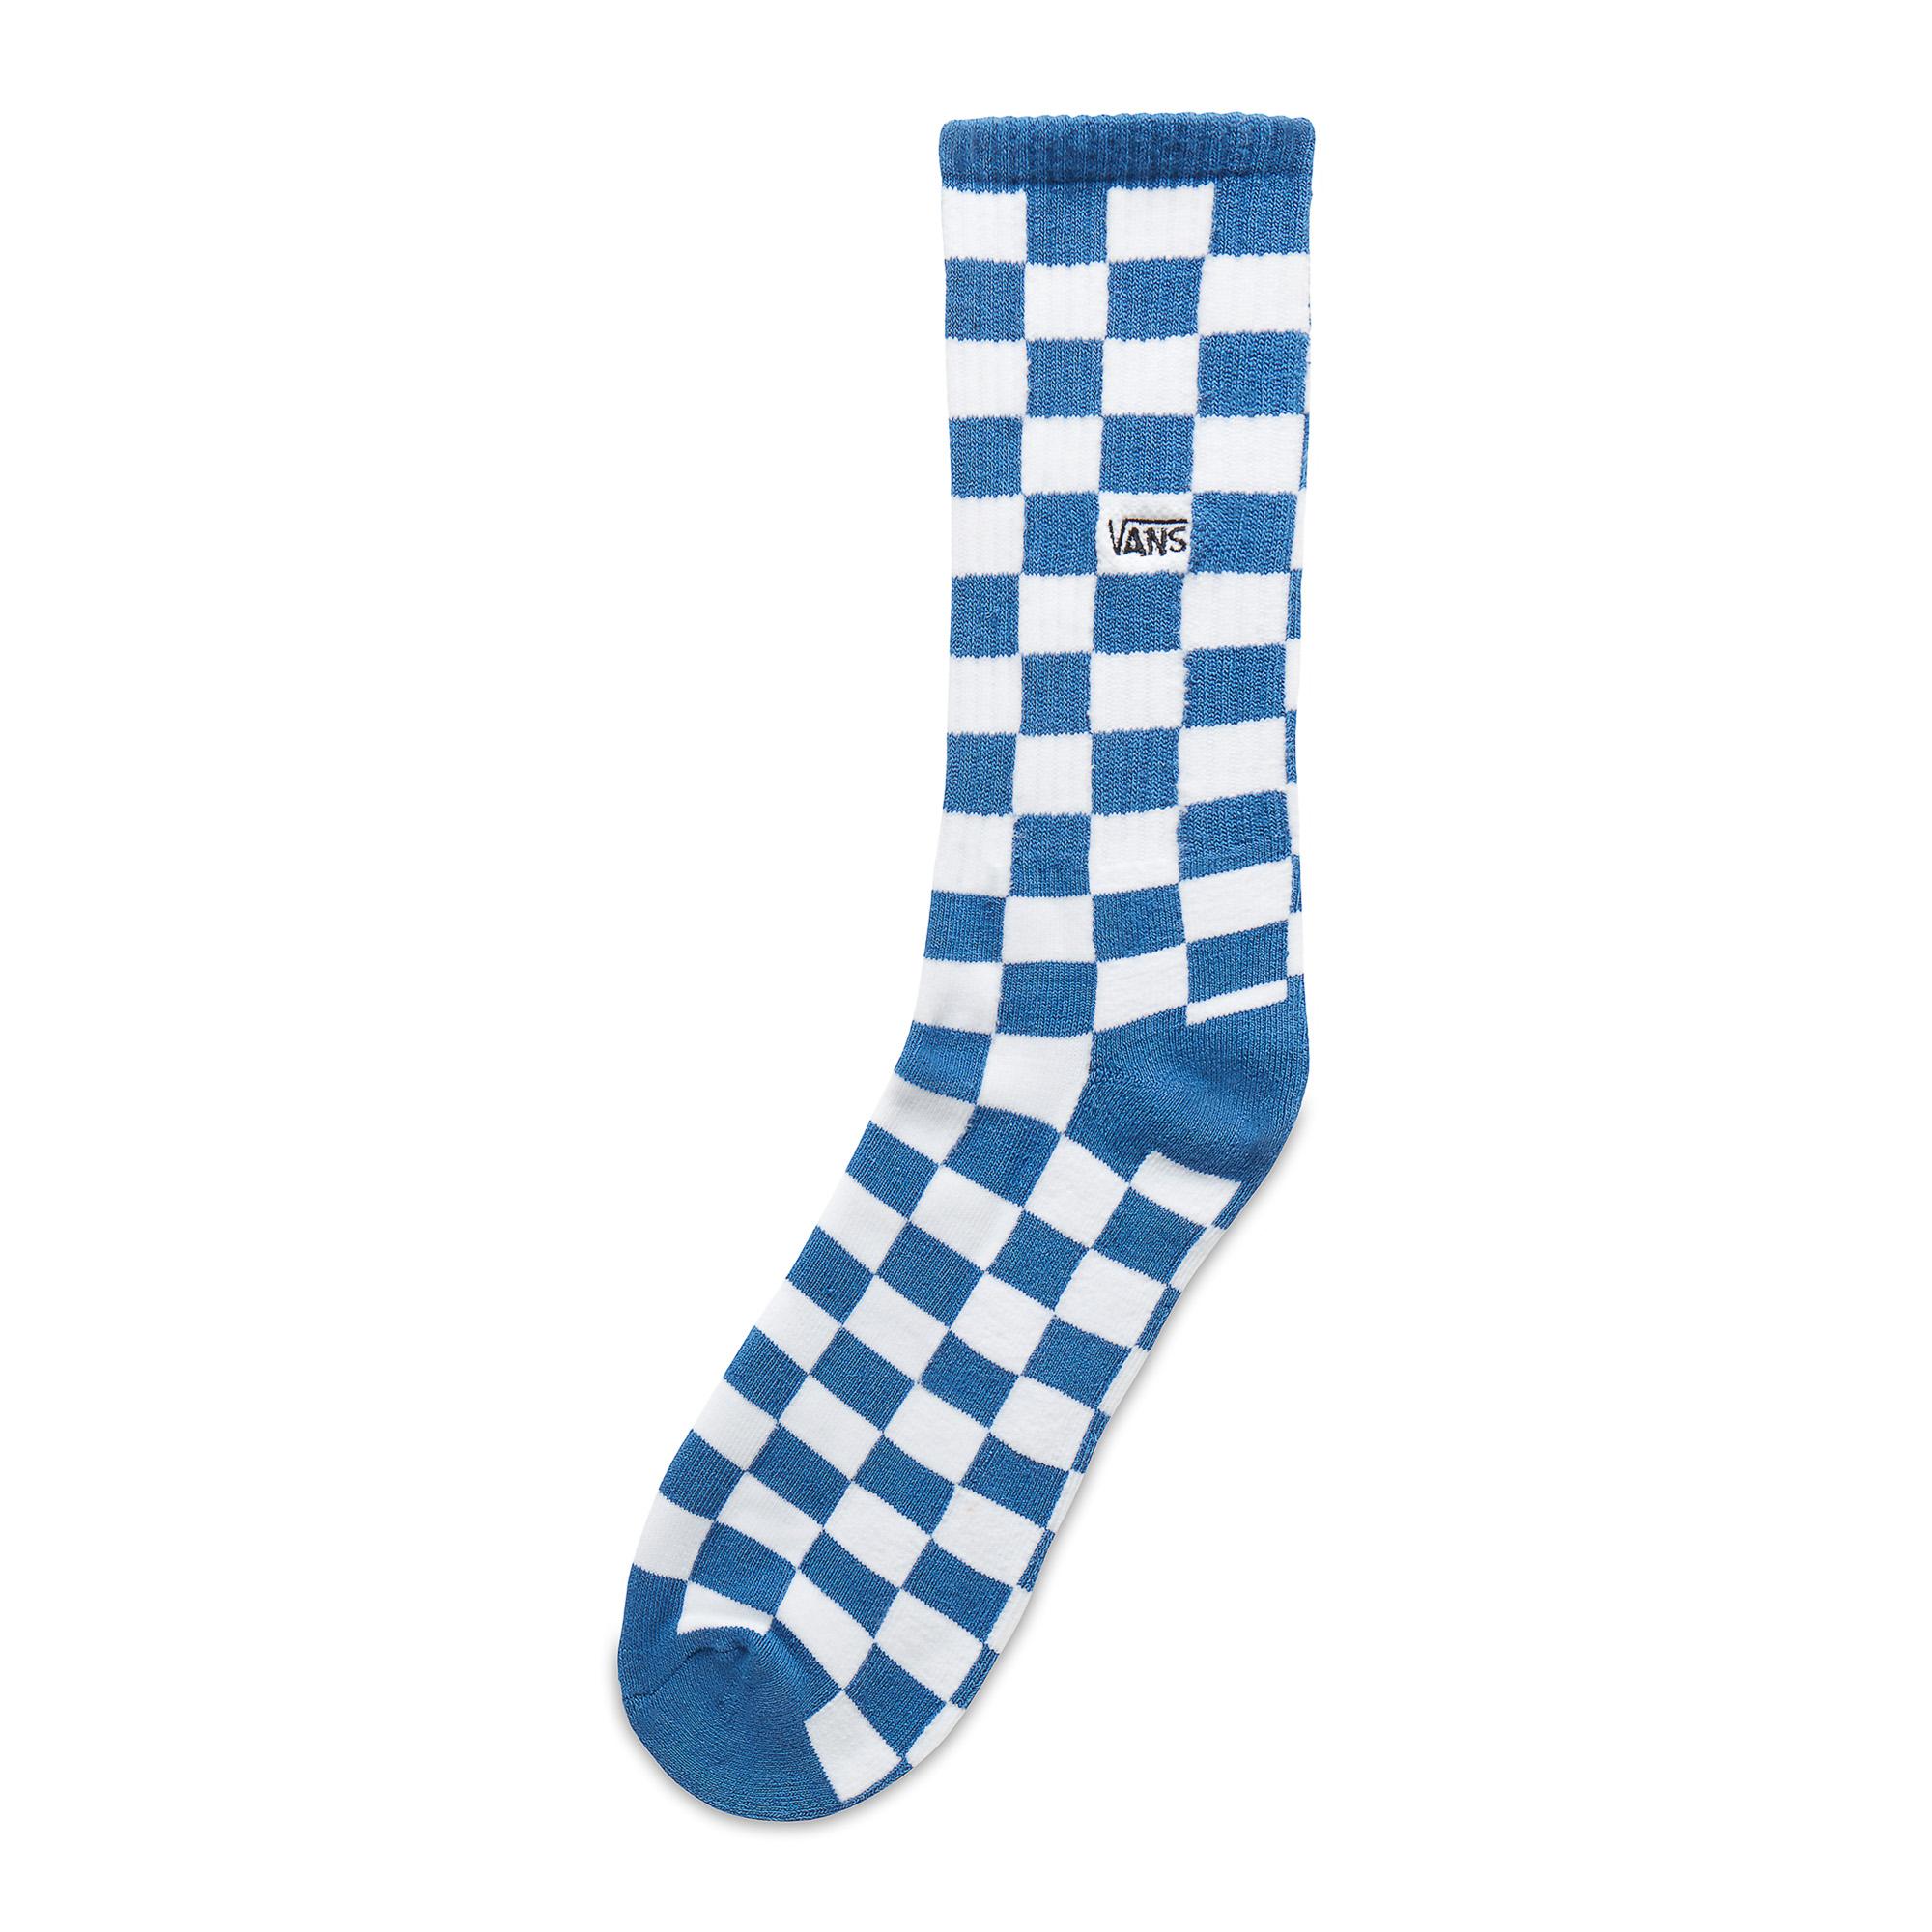 Купить Носки Checkerboard Crew, VANS, Китай, Голубой/Белый, 47% хлопок 44% нейлон 5% резина 4% эластан